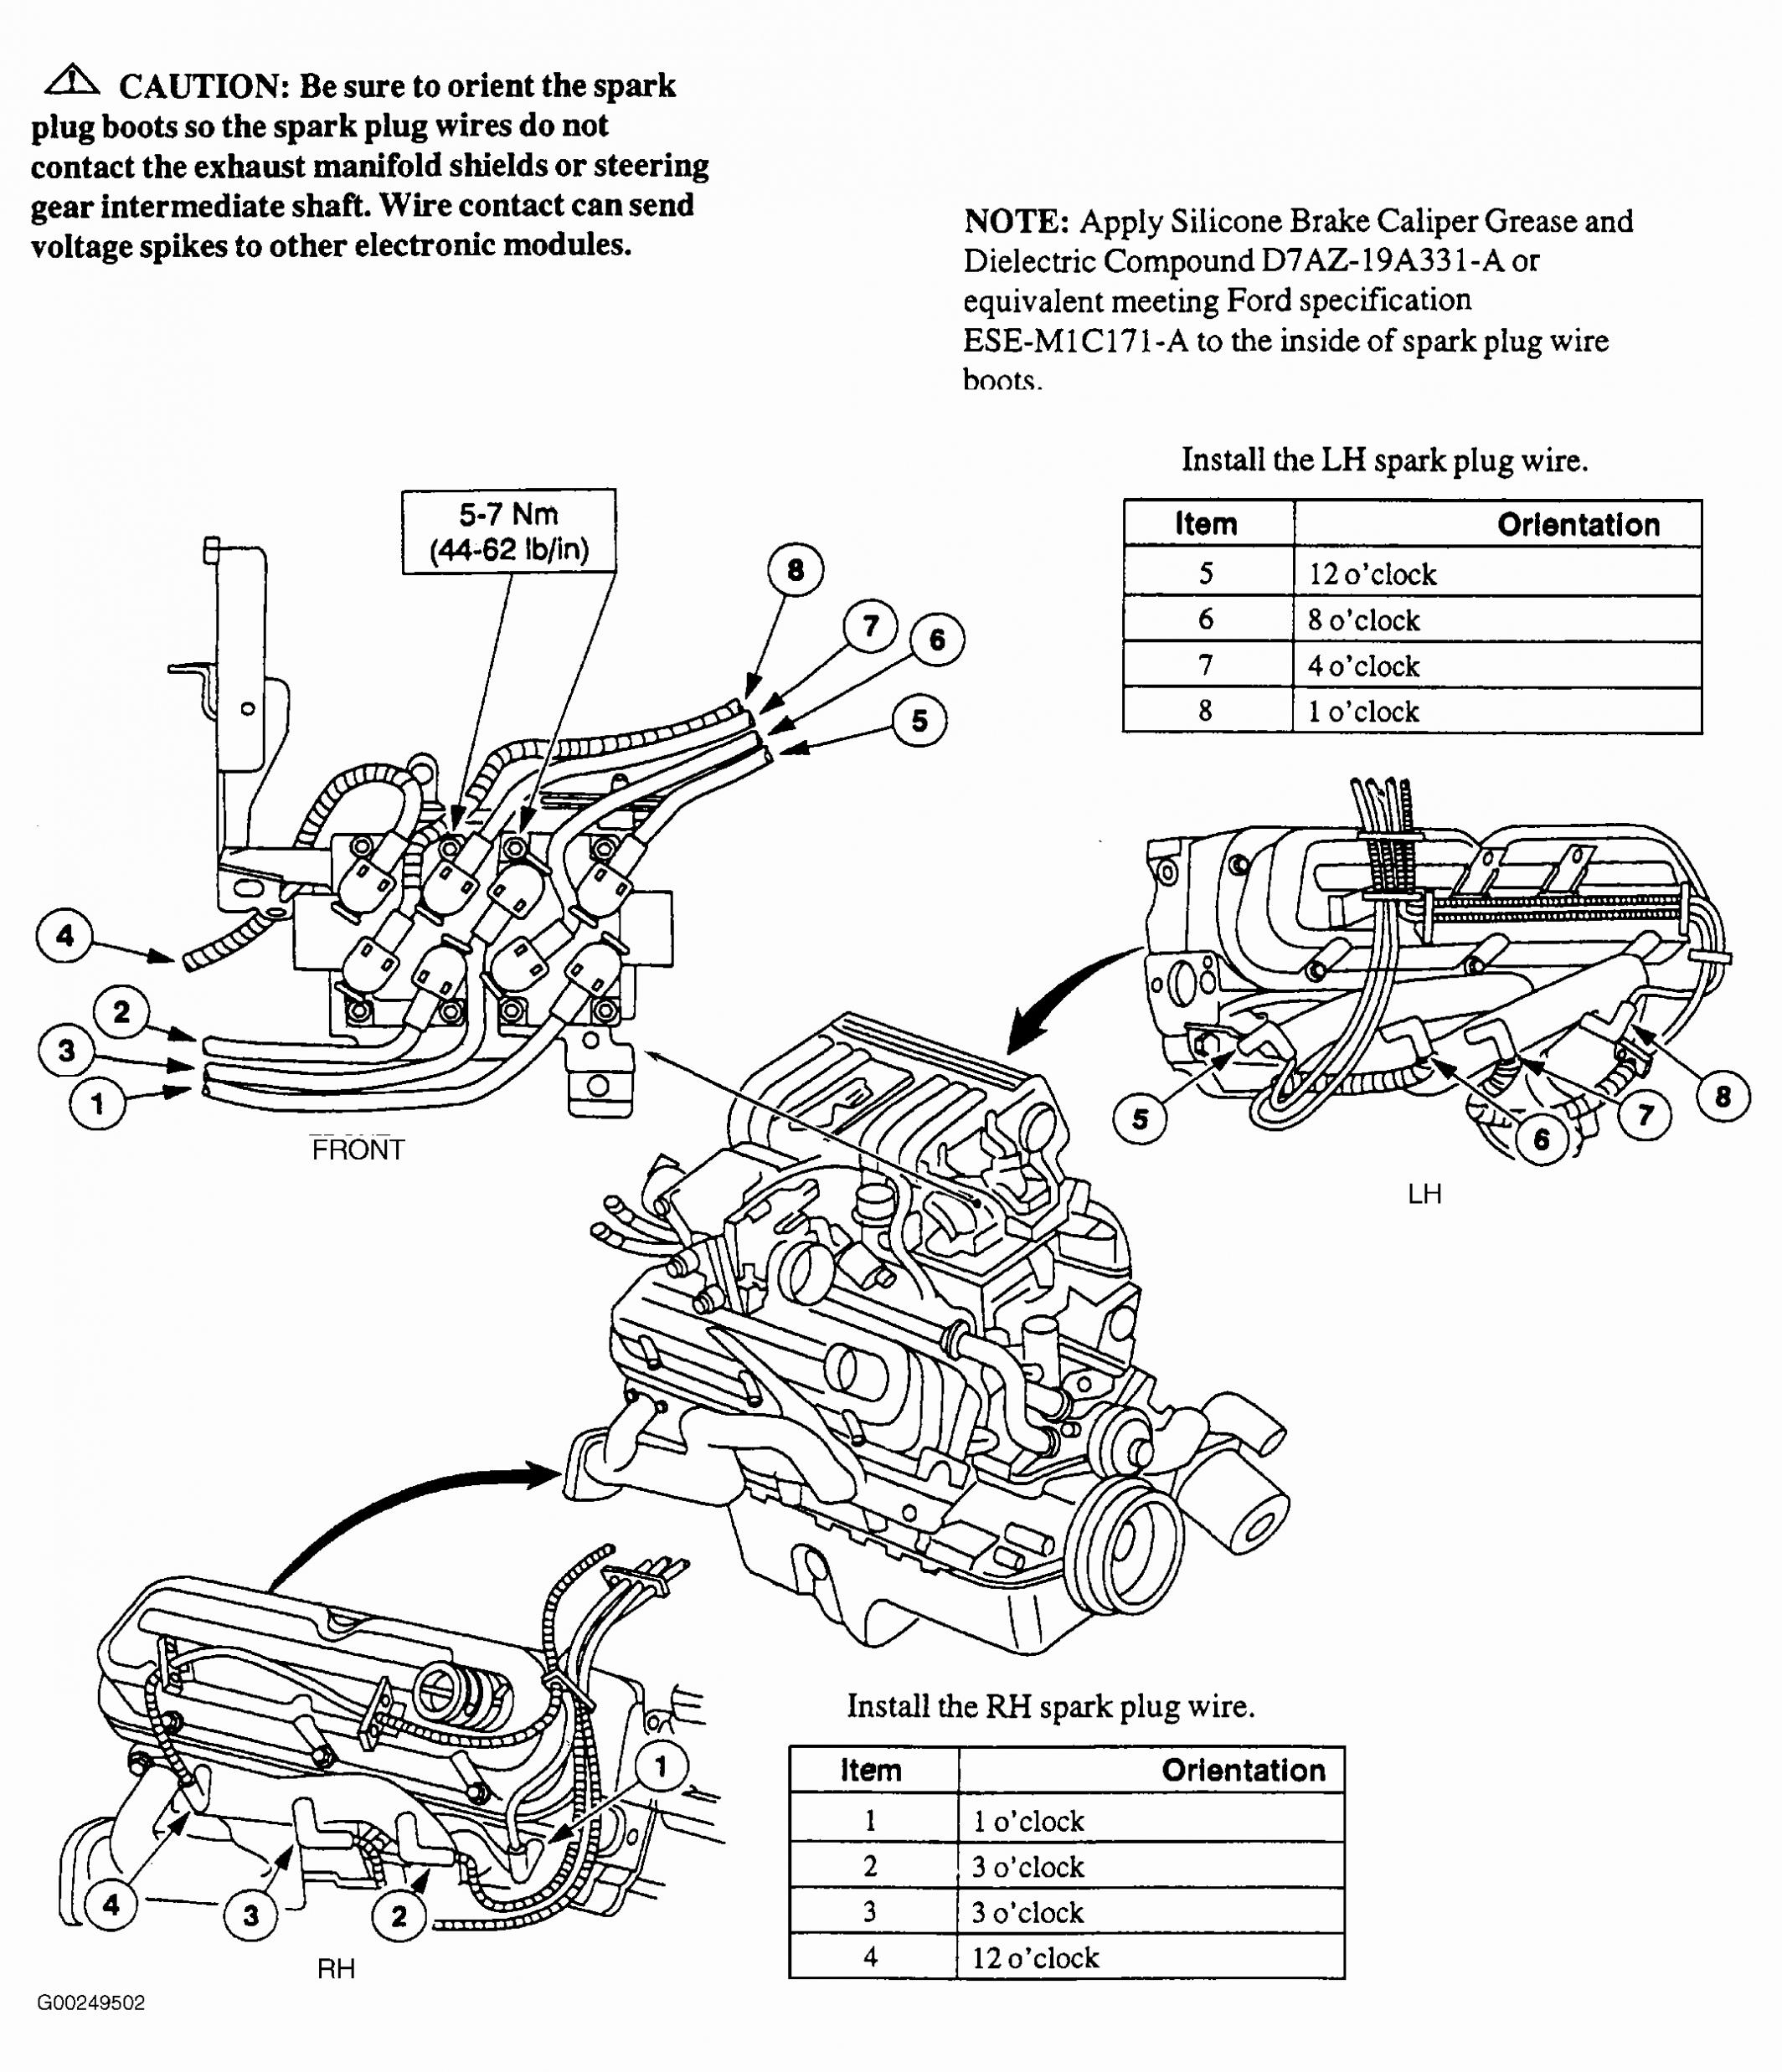 Download [Diagram] Ford Ranger 4 0 Engine Diagram Ze Plugs